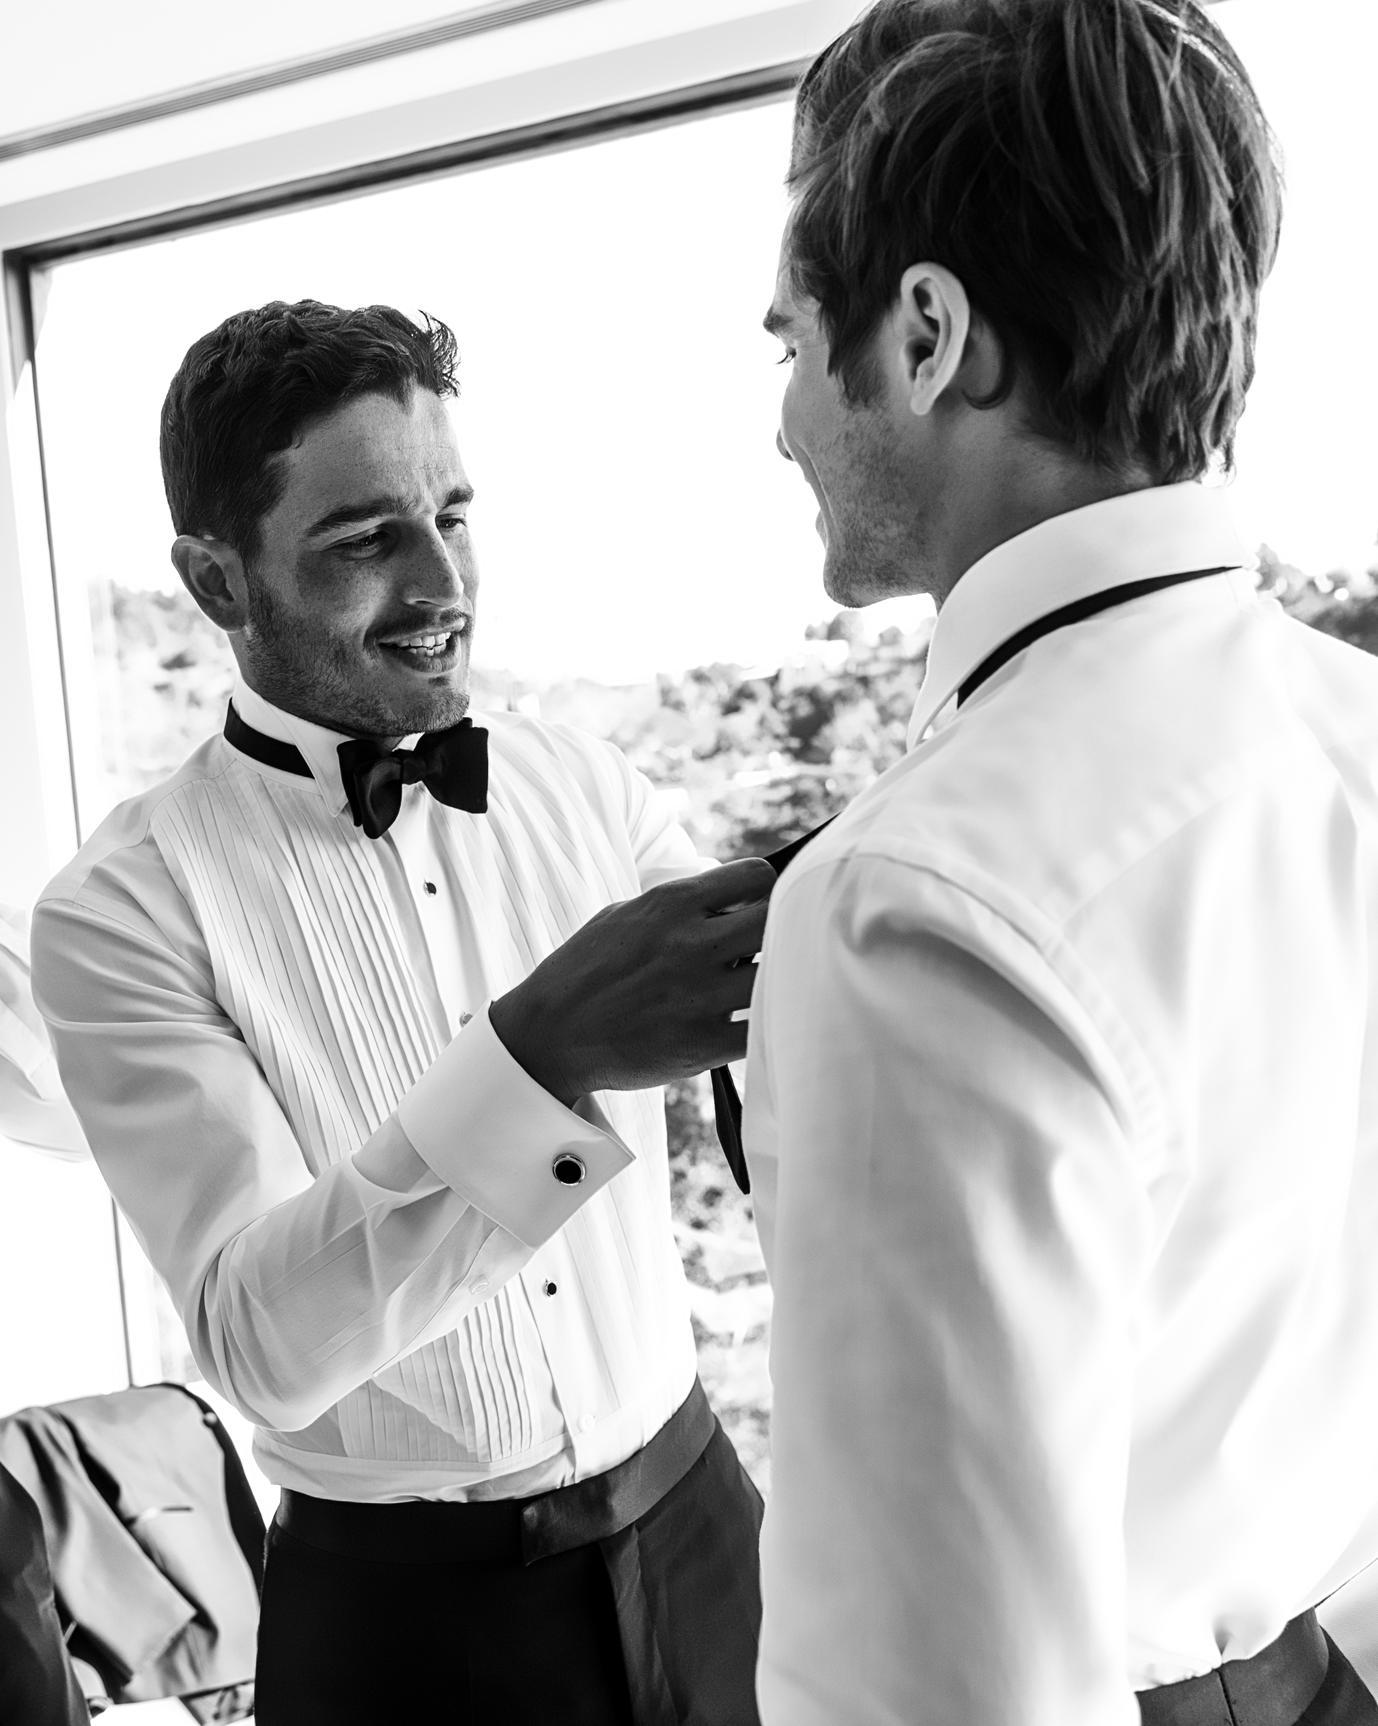 groomsmen_style_tips0516